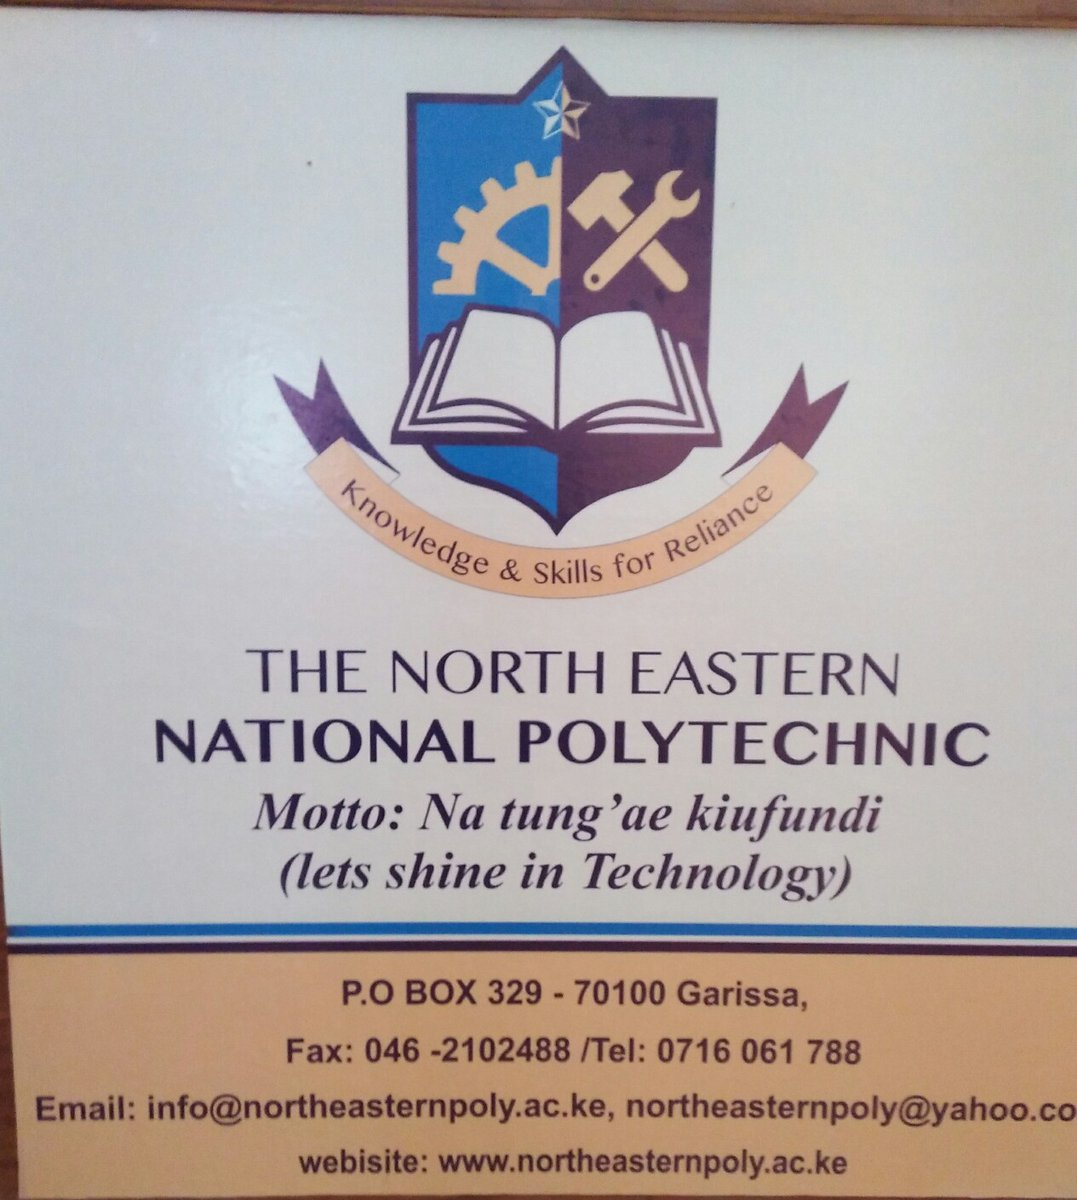 Northeastern University Calendar 2022.North Eastern National Polytechnic Admission List 2021 2022 Intake Kenyapen Kenyapen